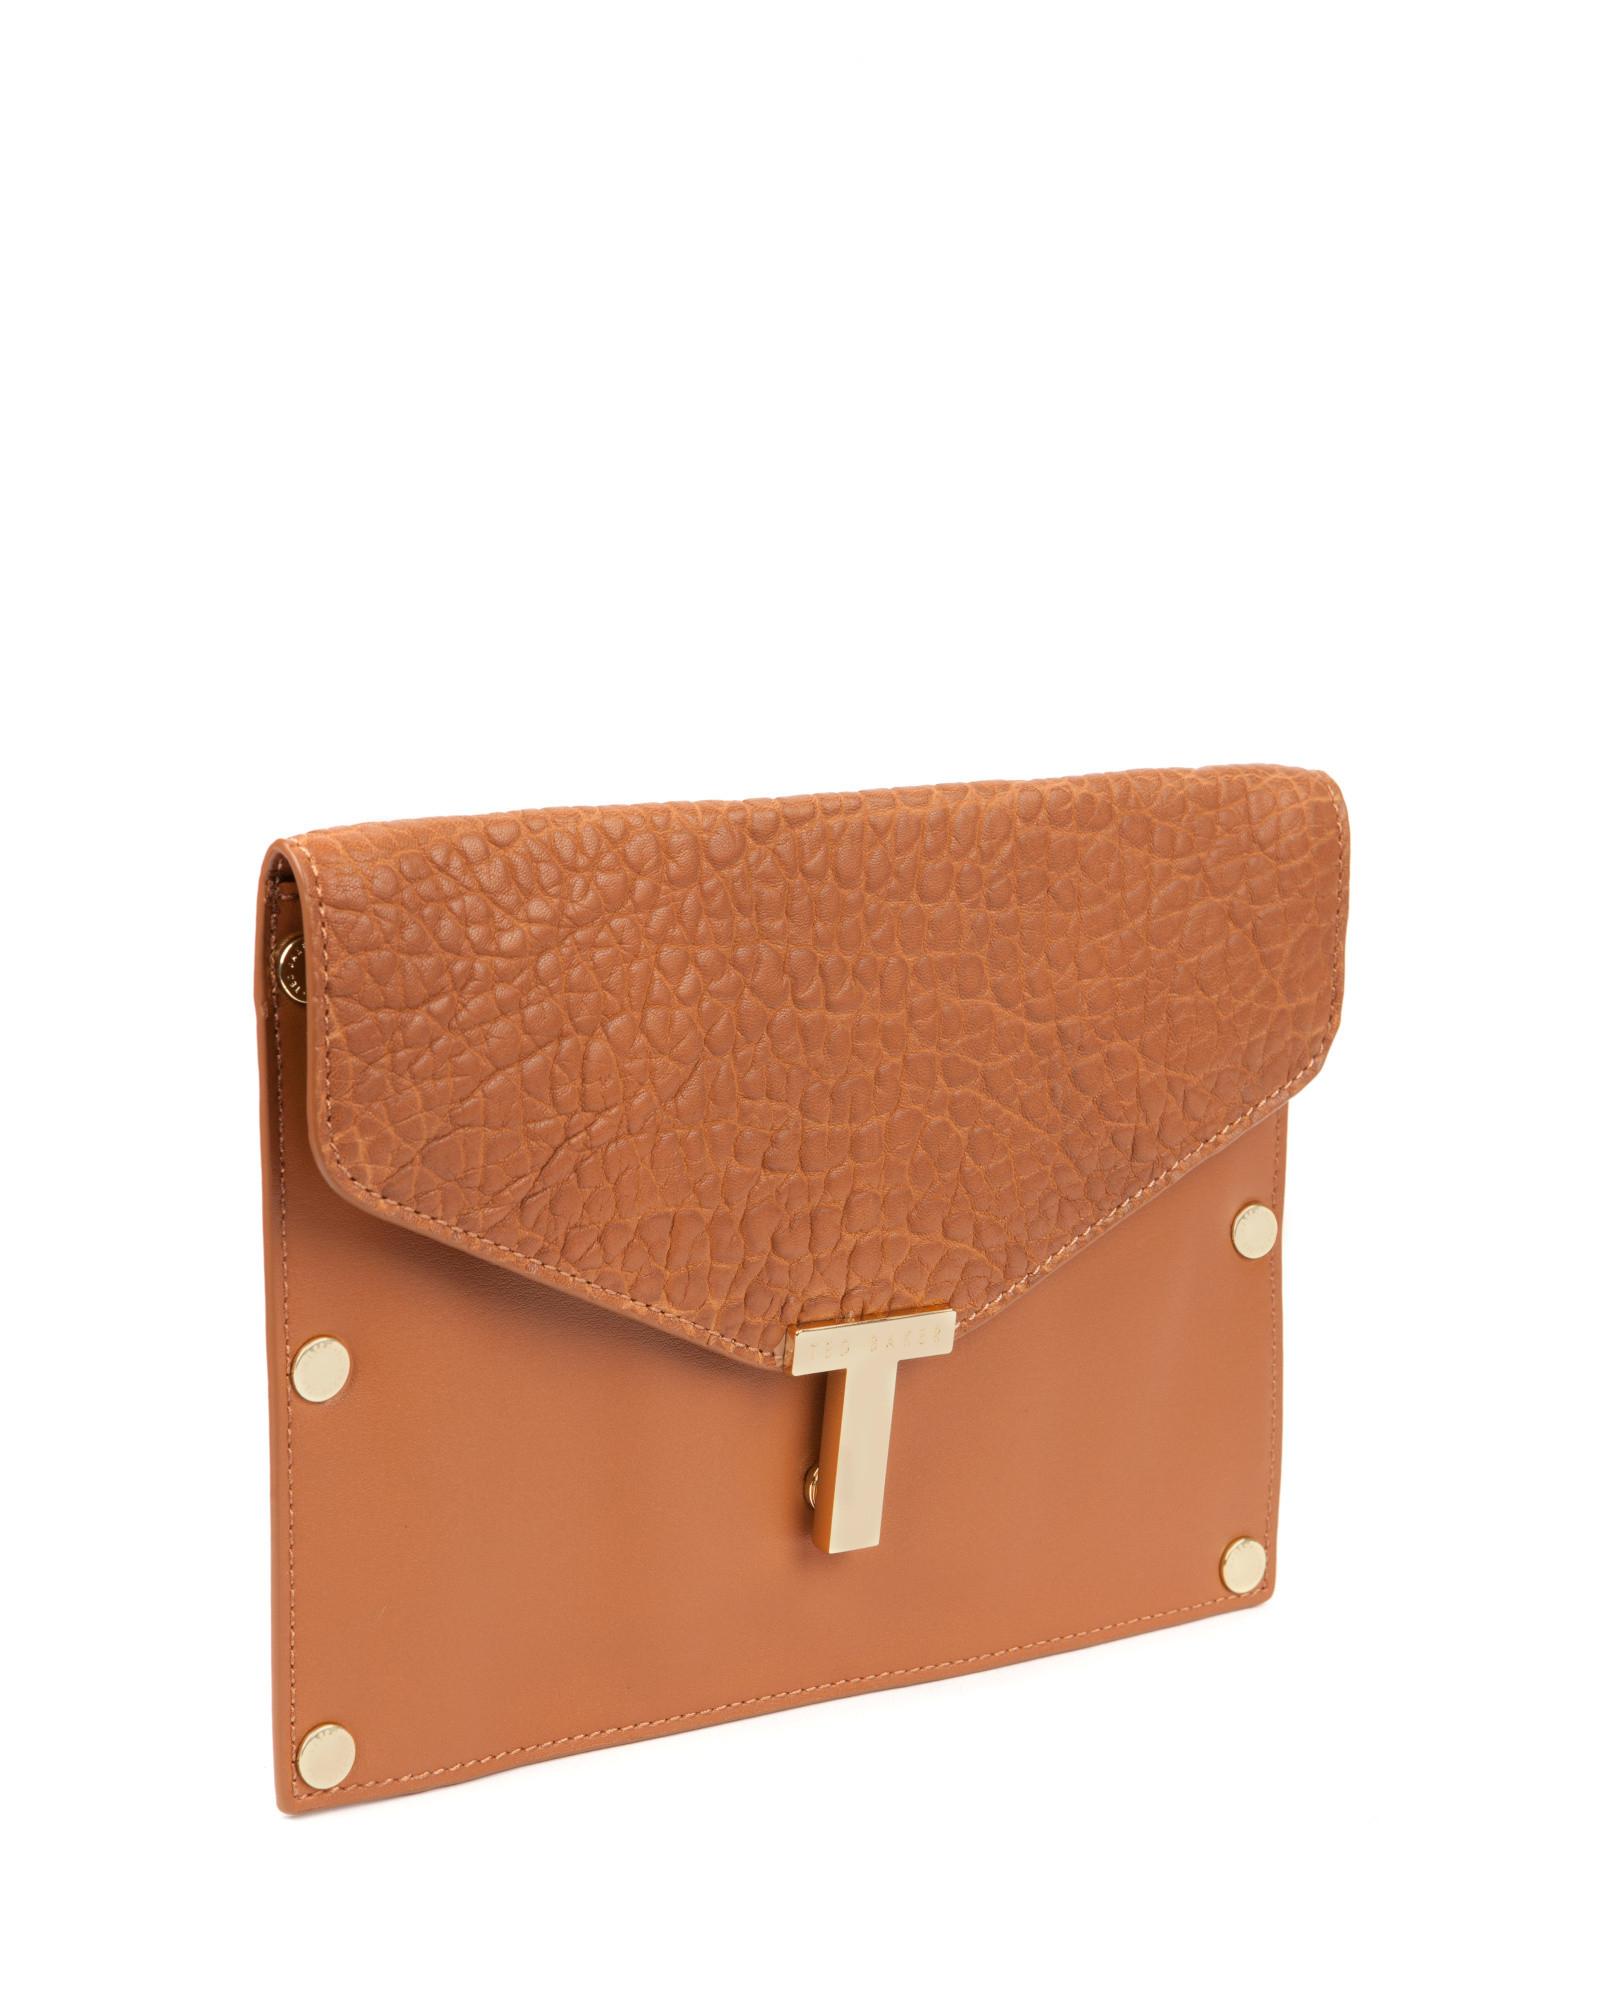 Yoki Croc Effect Clutch Bag With Detachable Strap - Grey Yoki Fashion UdFJYI1Luo